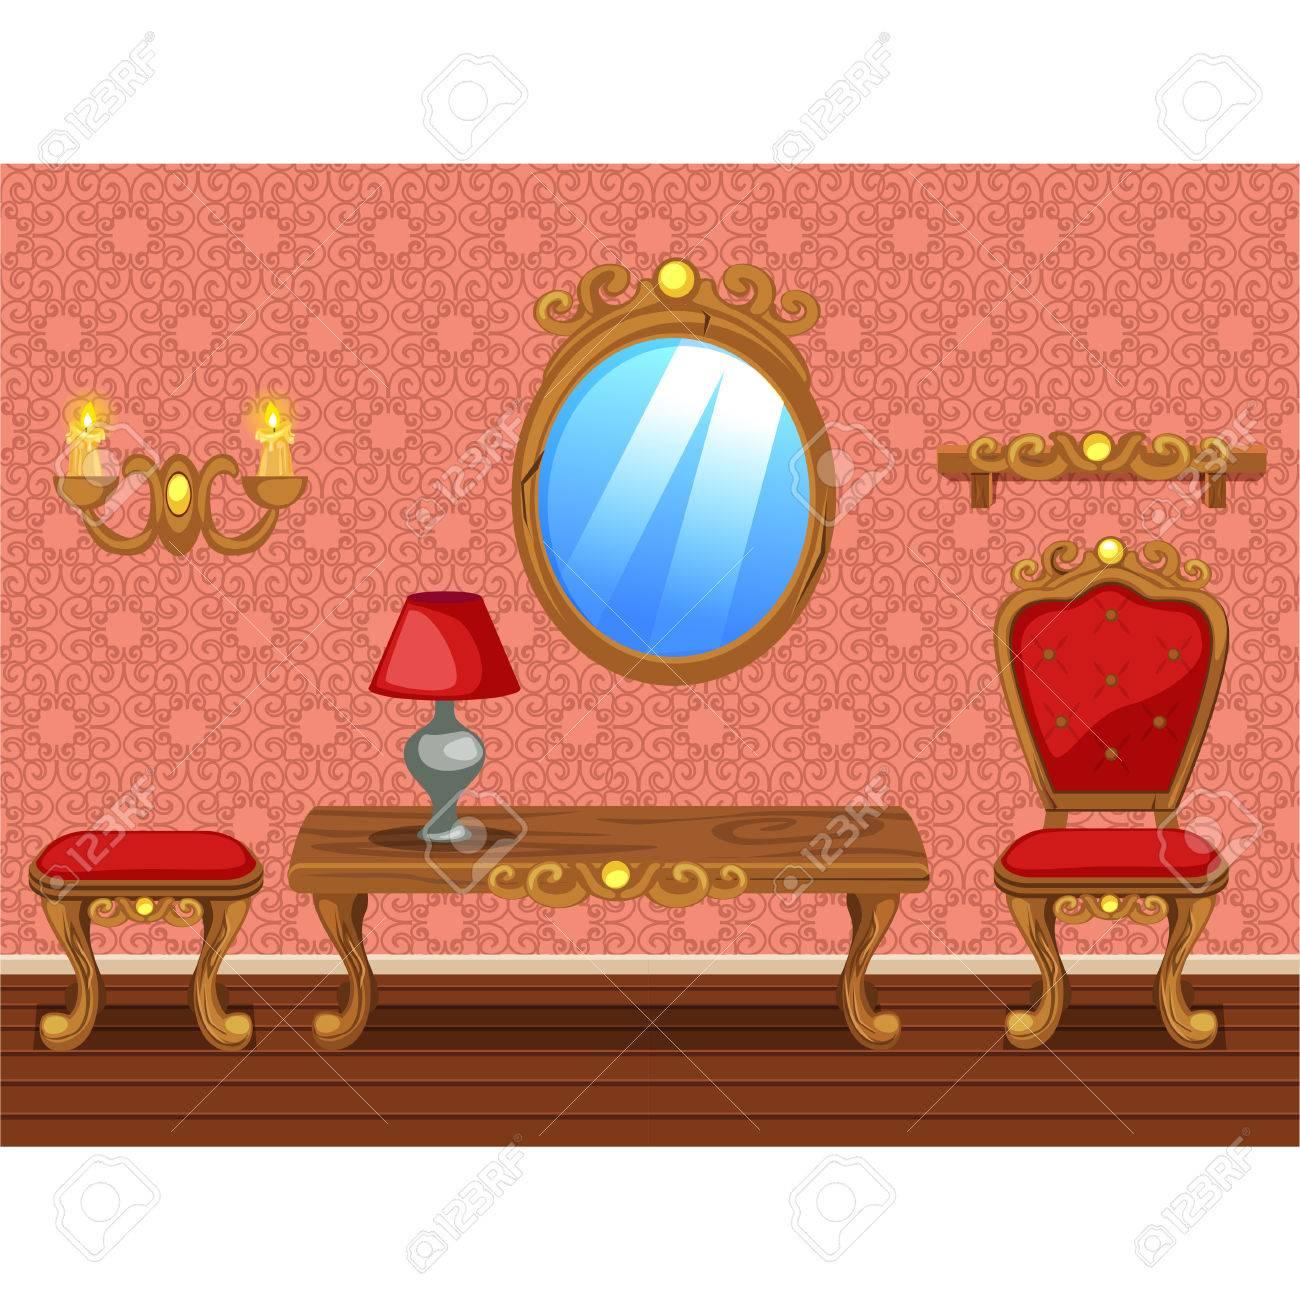 Set Karikatur Lustig Holz Retro Möbel, Rot Wohnzimmer Standard Bild    66815152